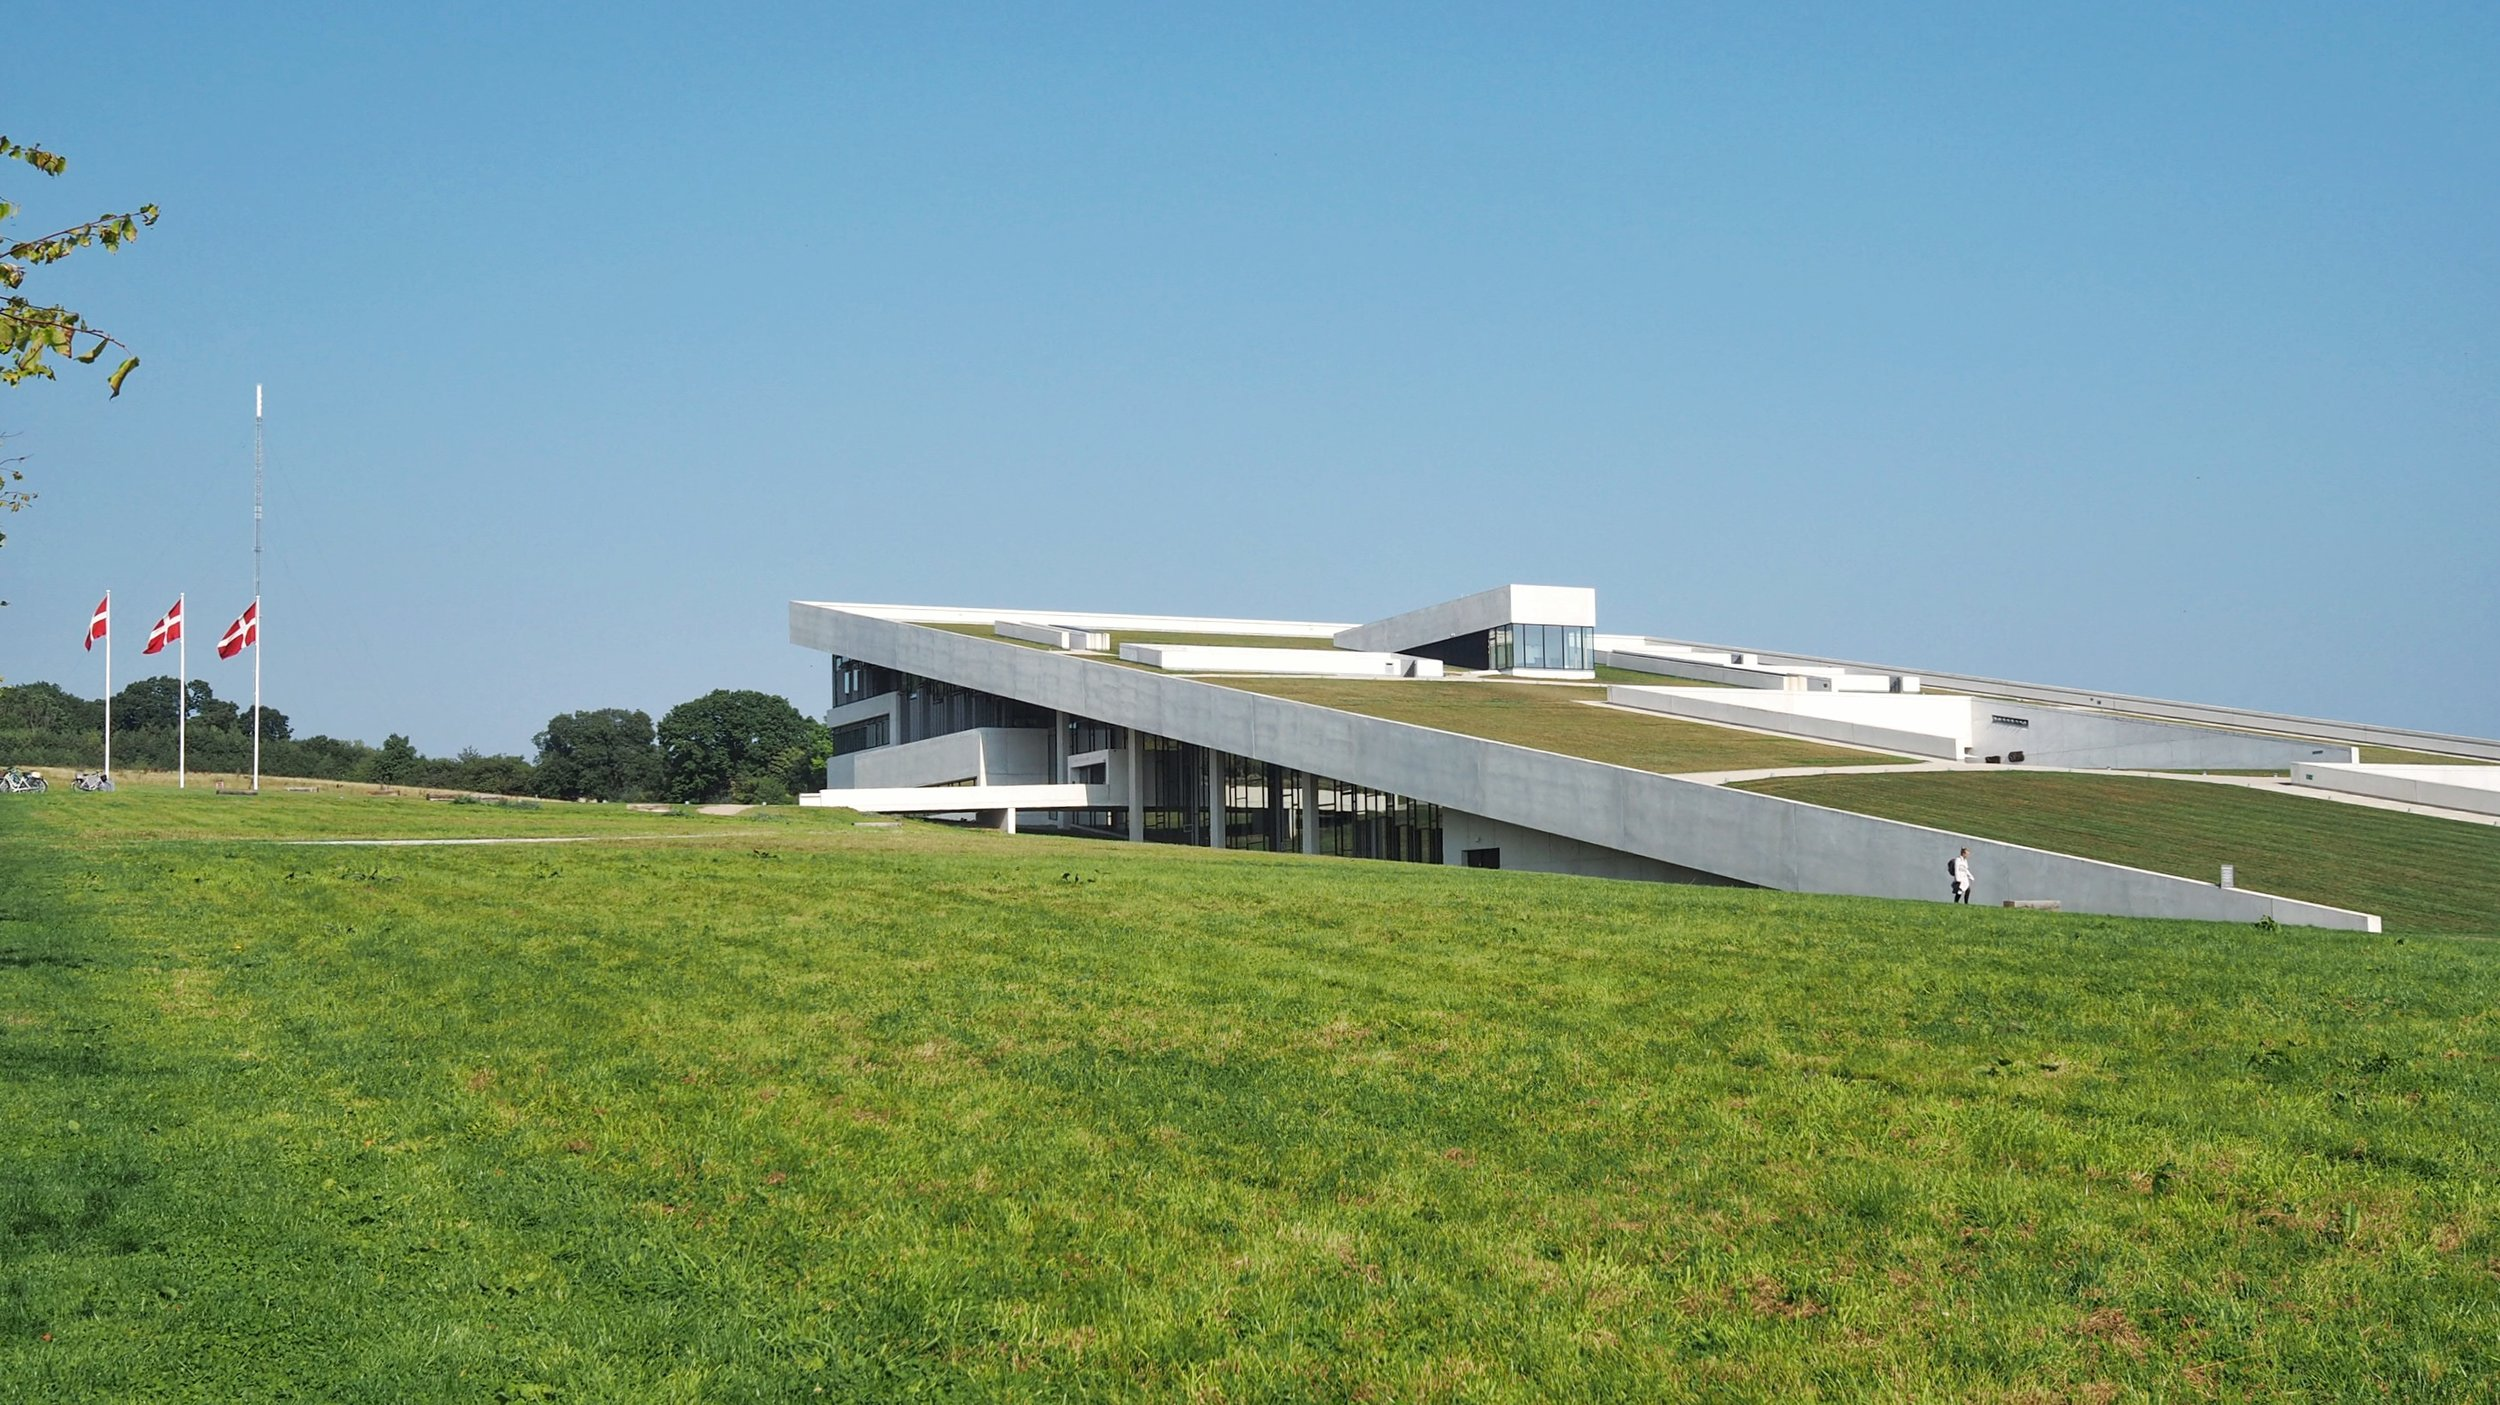 MOMU Building by Henning Larsen Architects